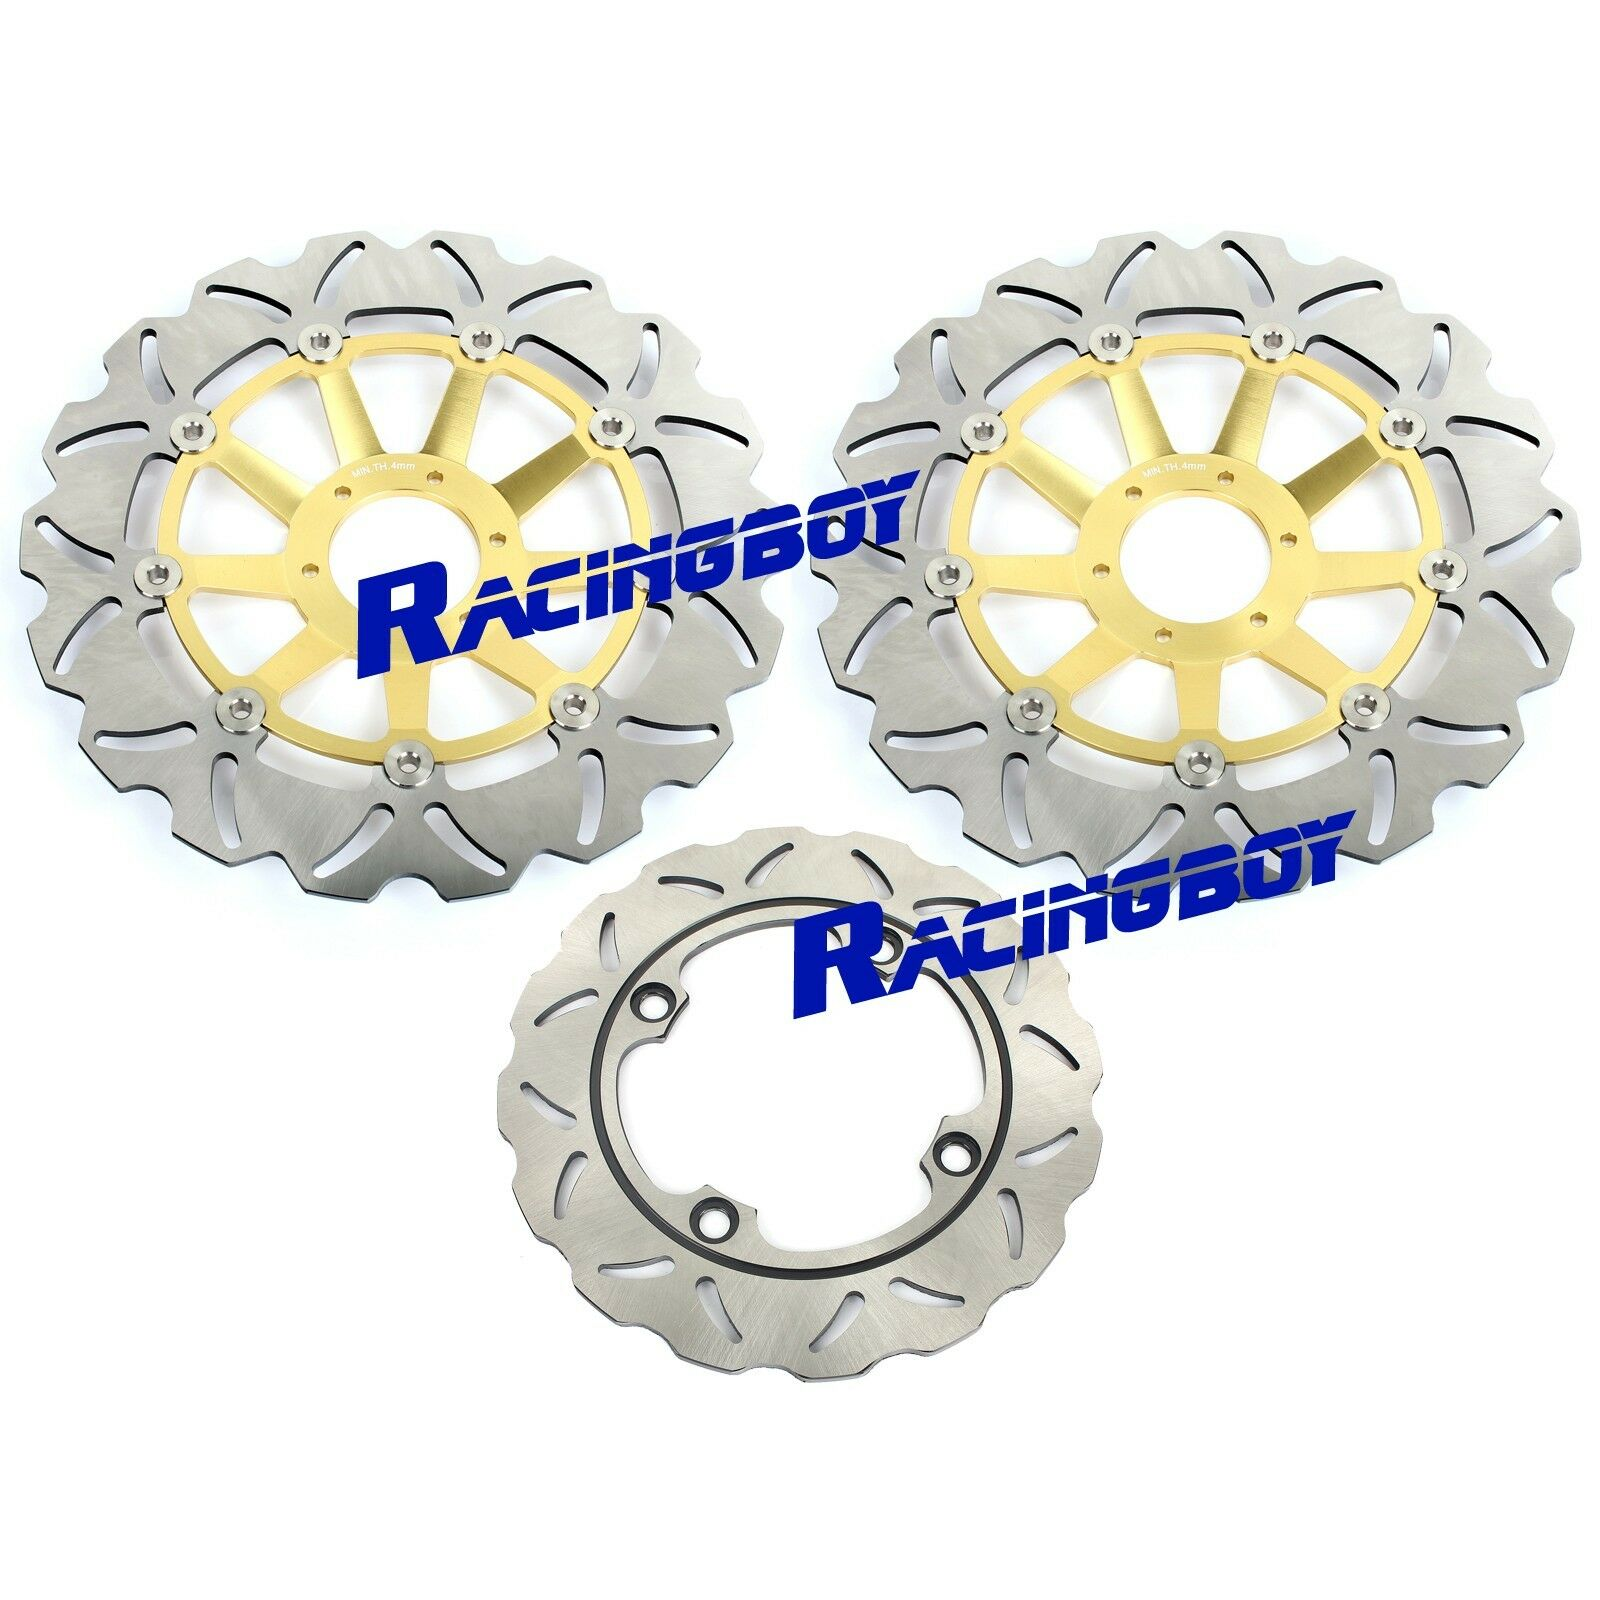 Rear Disc Brake Pads for Honda CBR900RR 1998 919cc By GOLDfren SC33